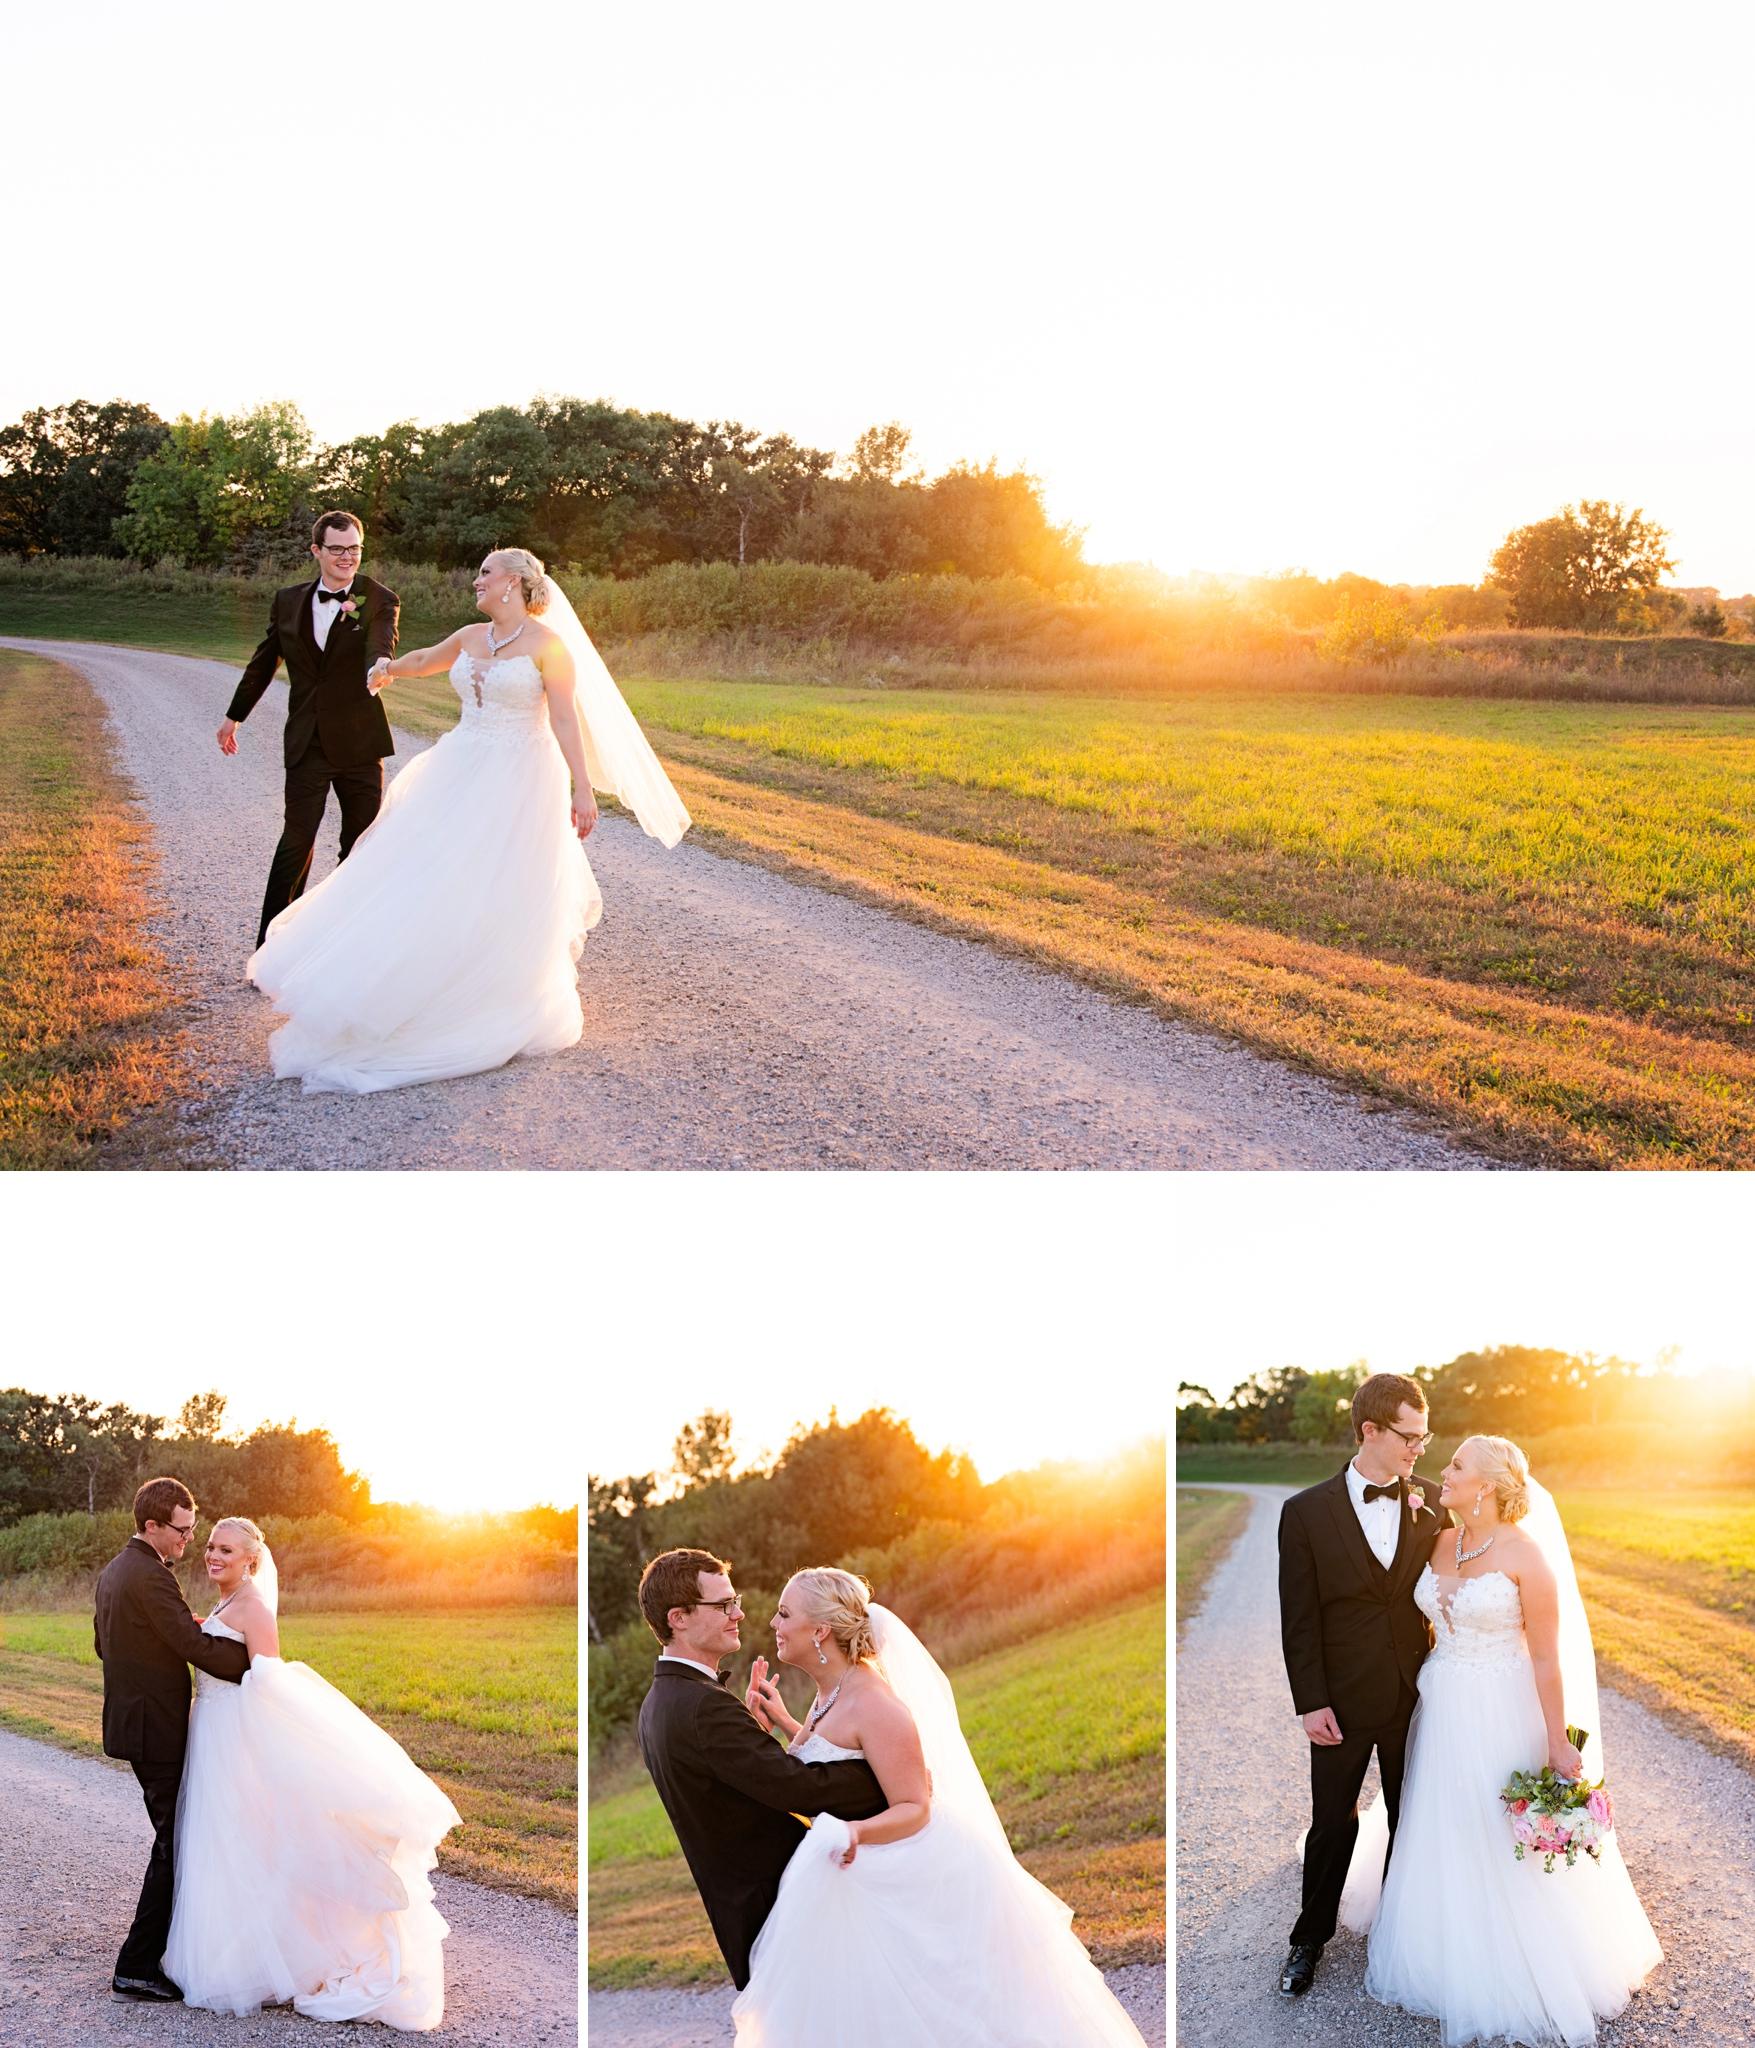 Brittany-Jay-Wedding-091518-Rotella-Photography-32_BLOG.jpg